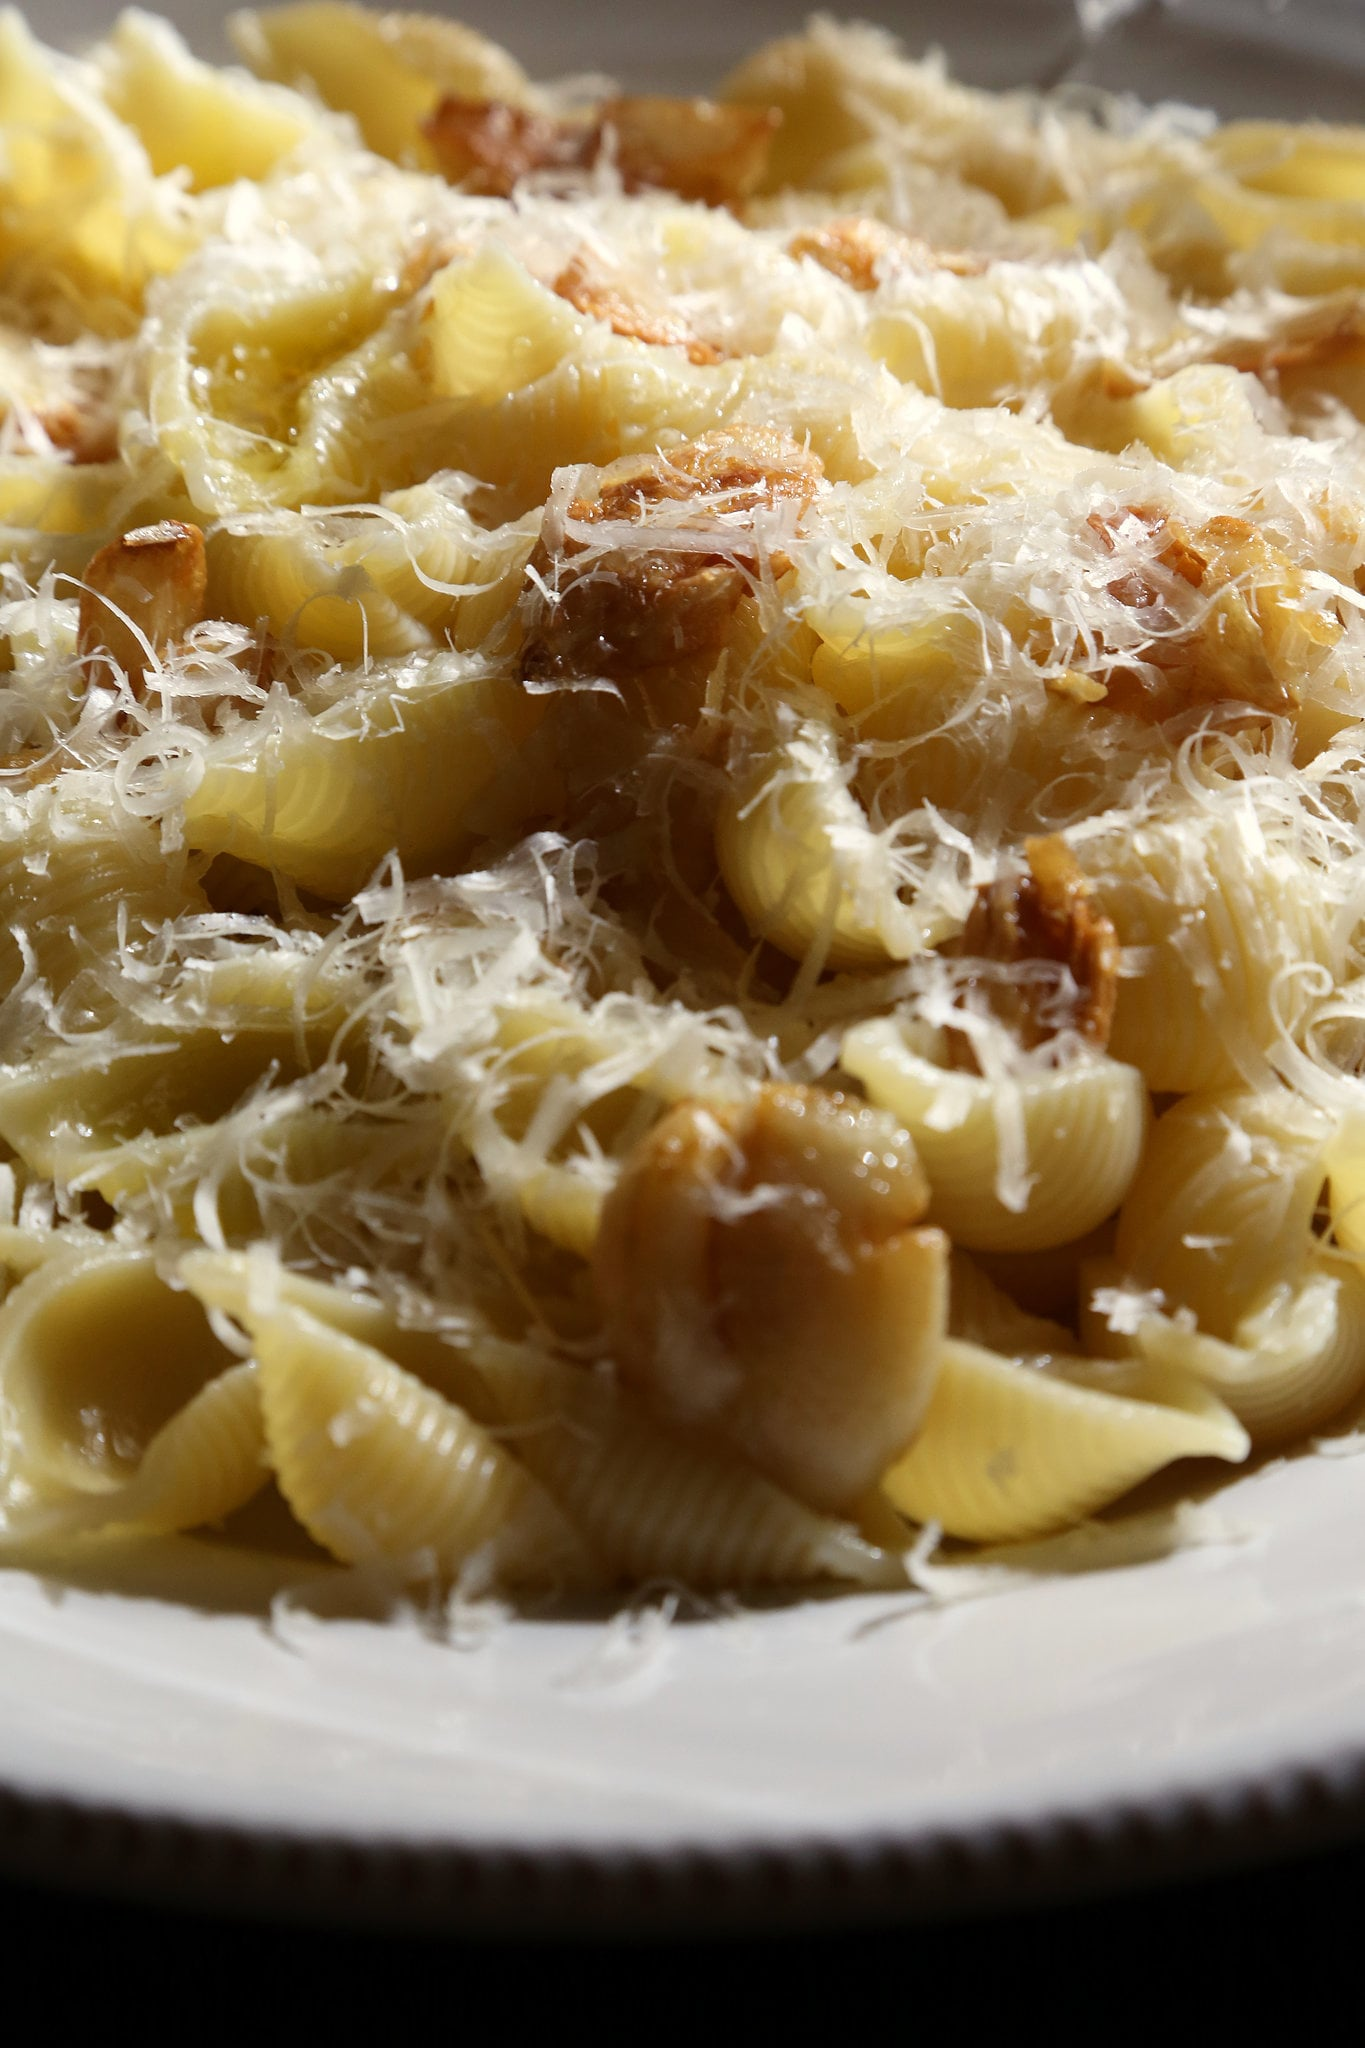 Caramelized Garlic and Parmesan Pasta